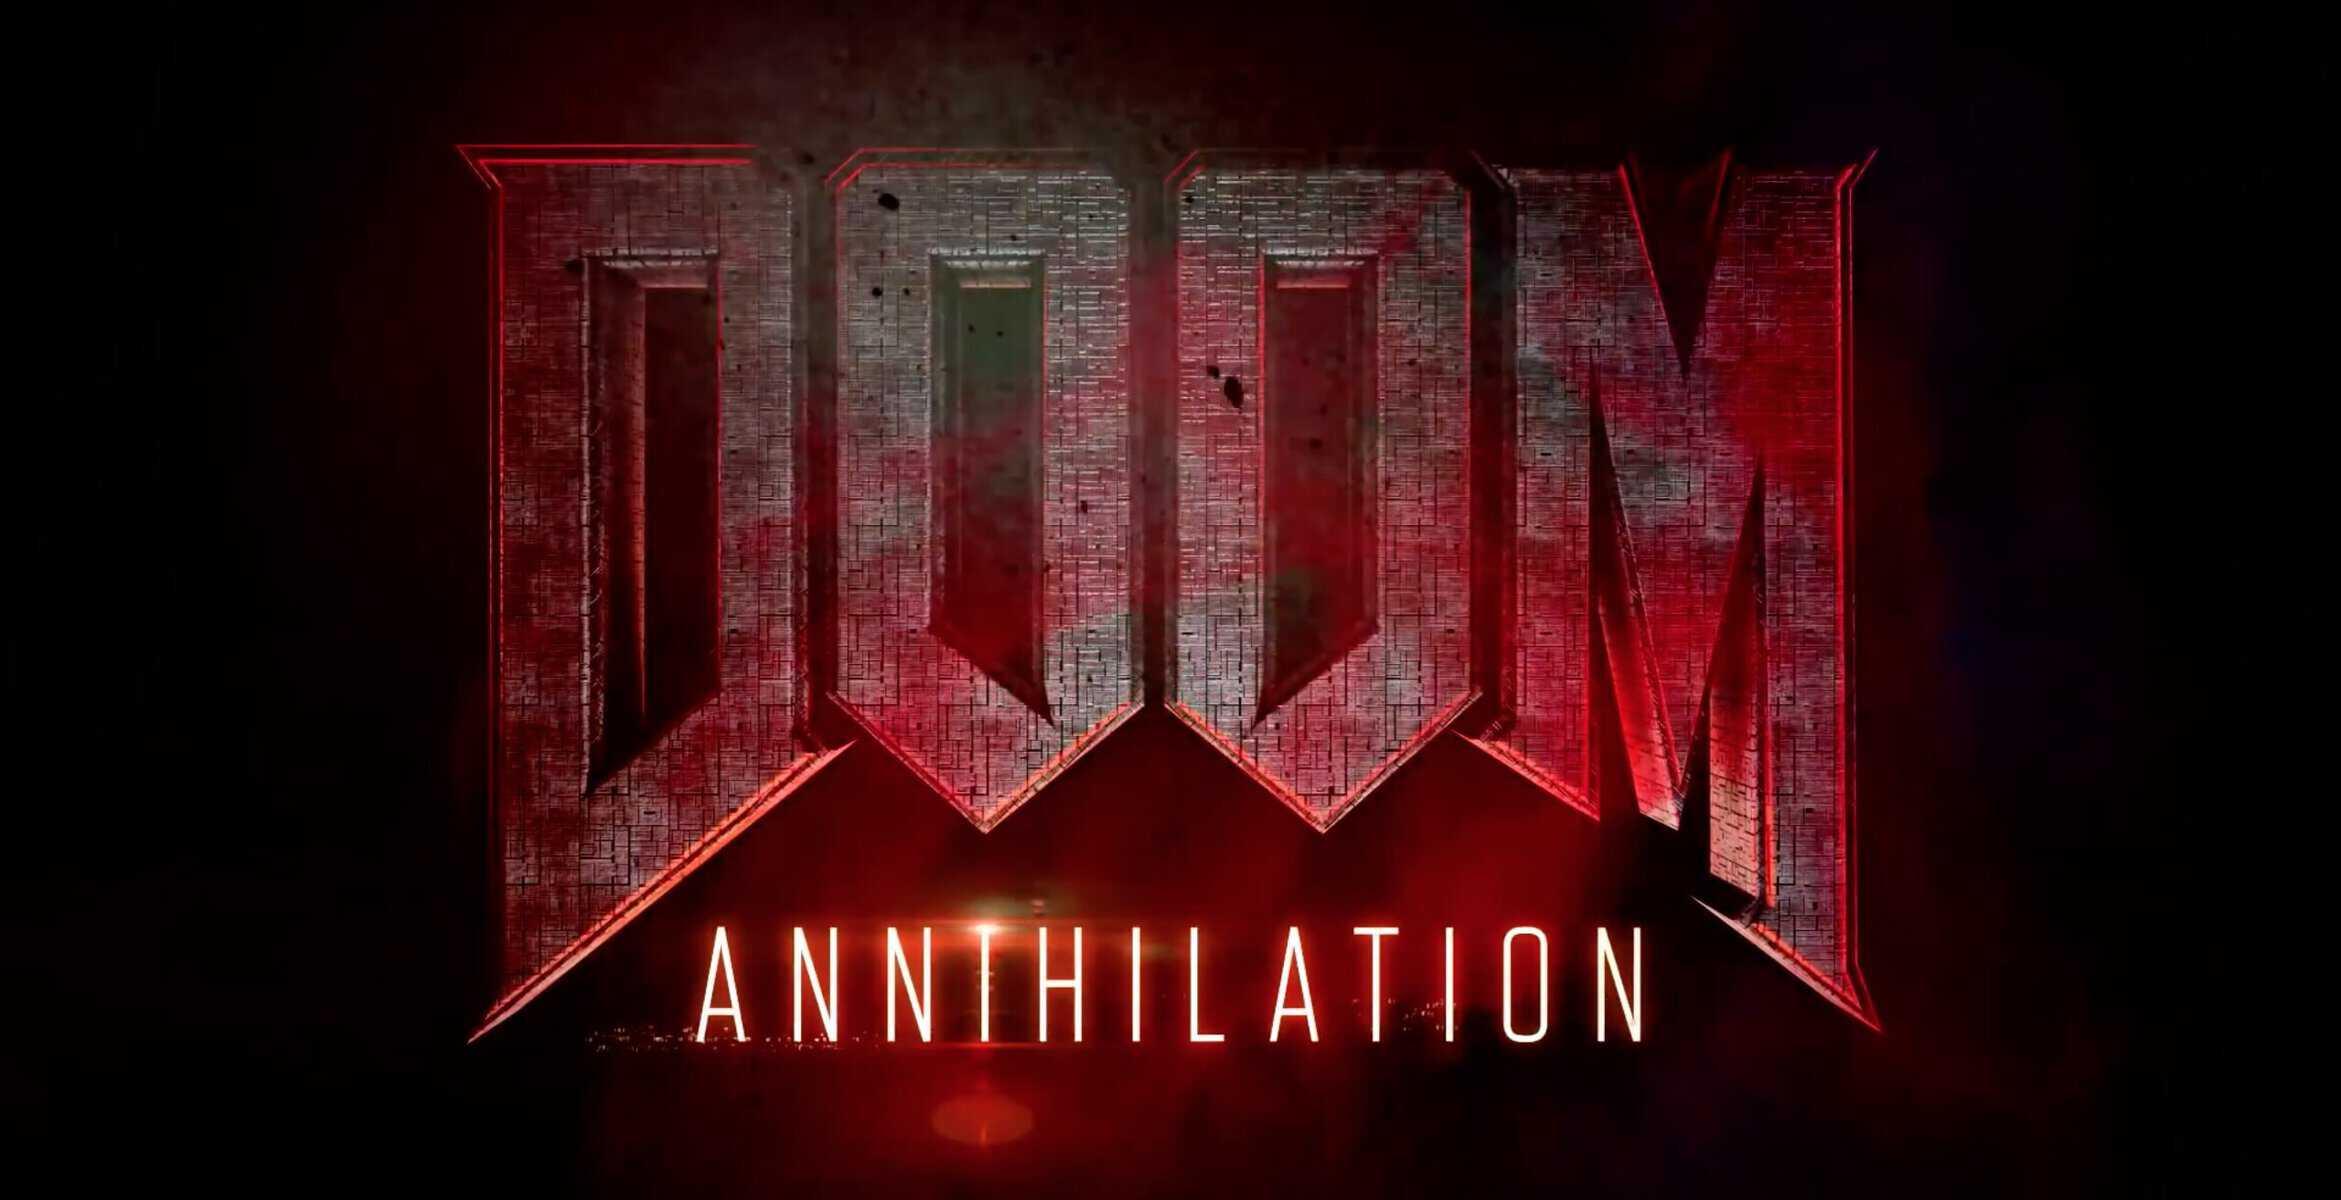 Doom Annihilation sera commercialisé en direct-to-video